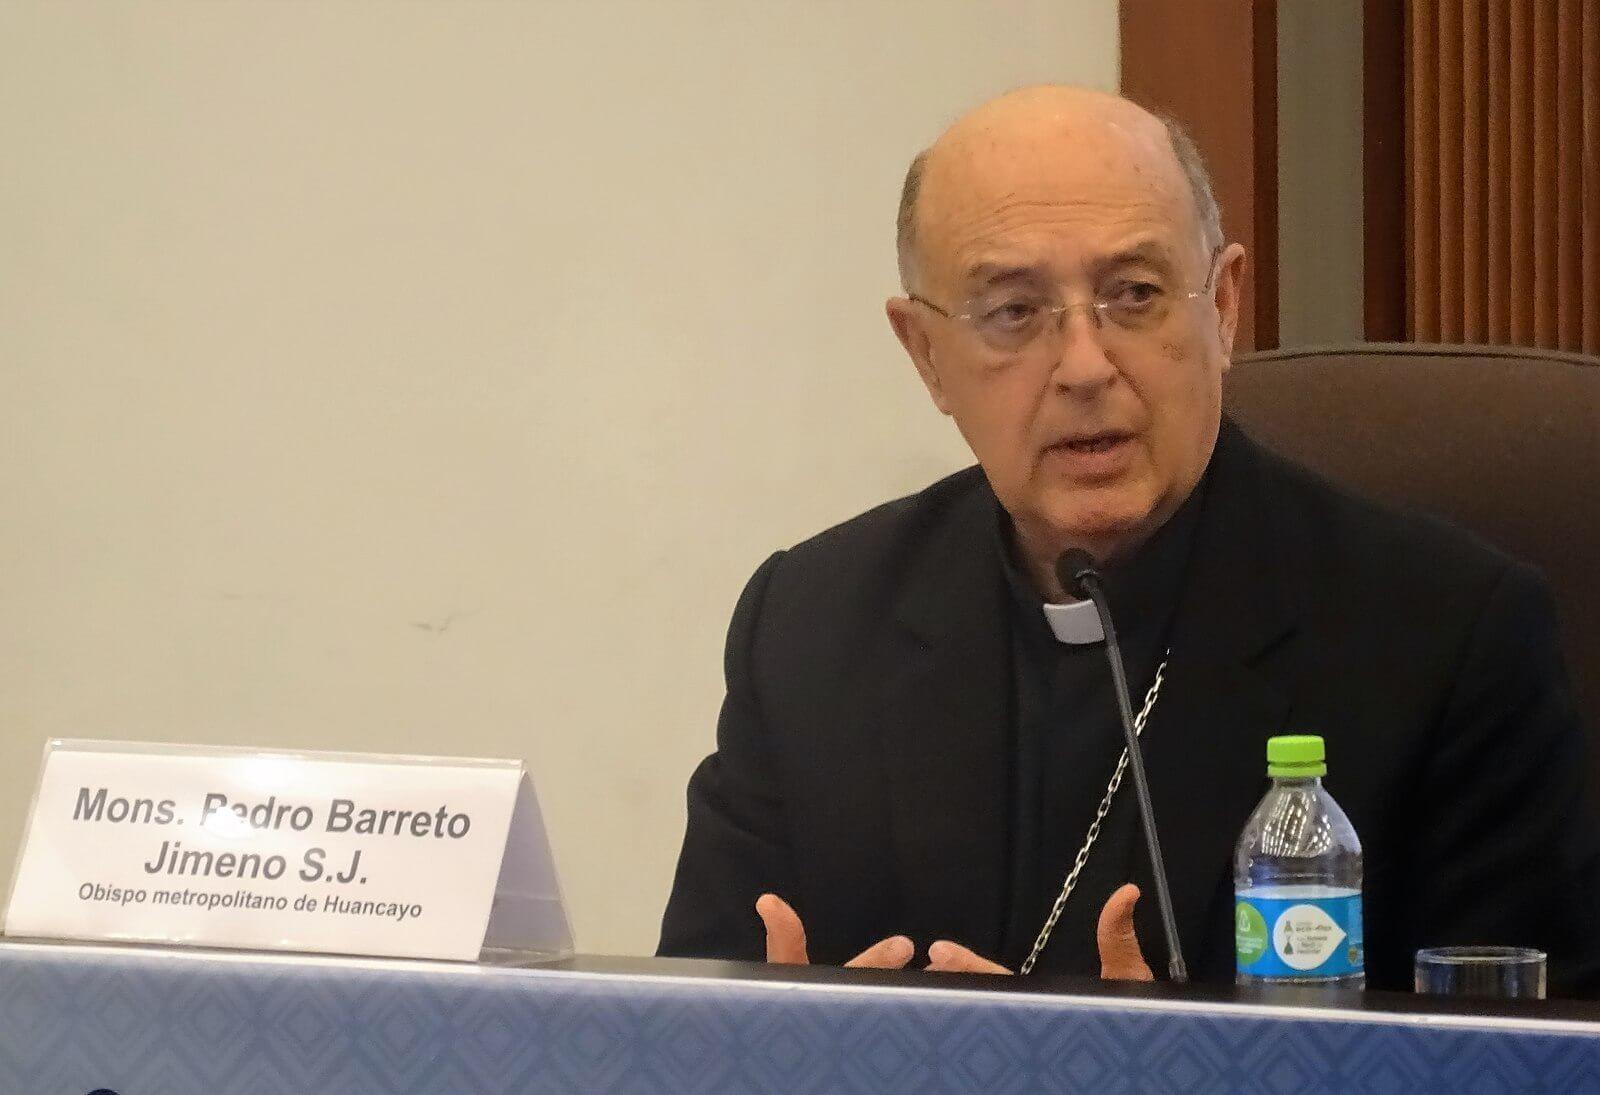 Peru Cardinal criticizes 'slowness' of judicial reform process